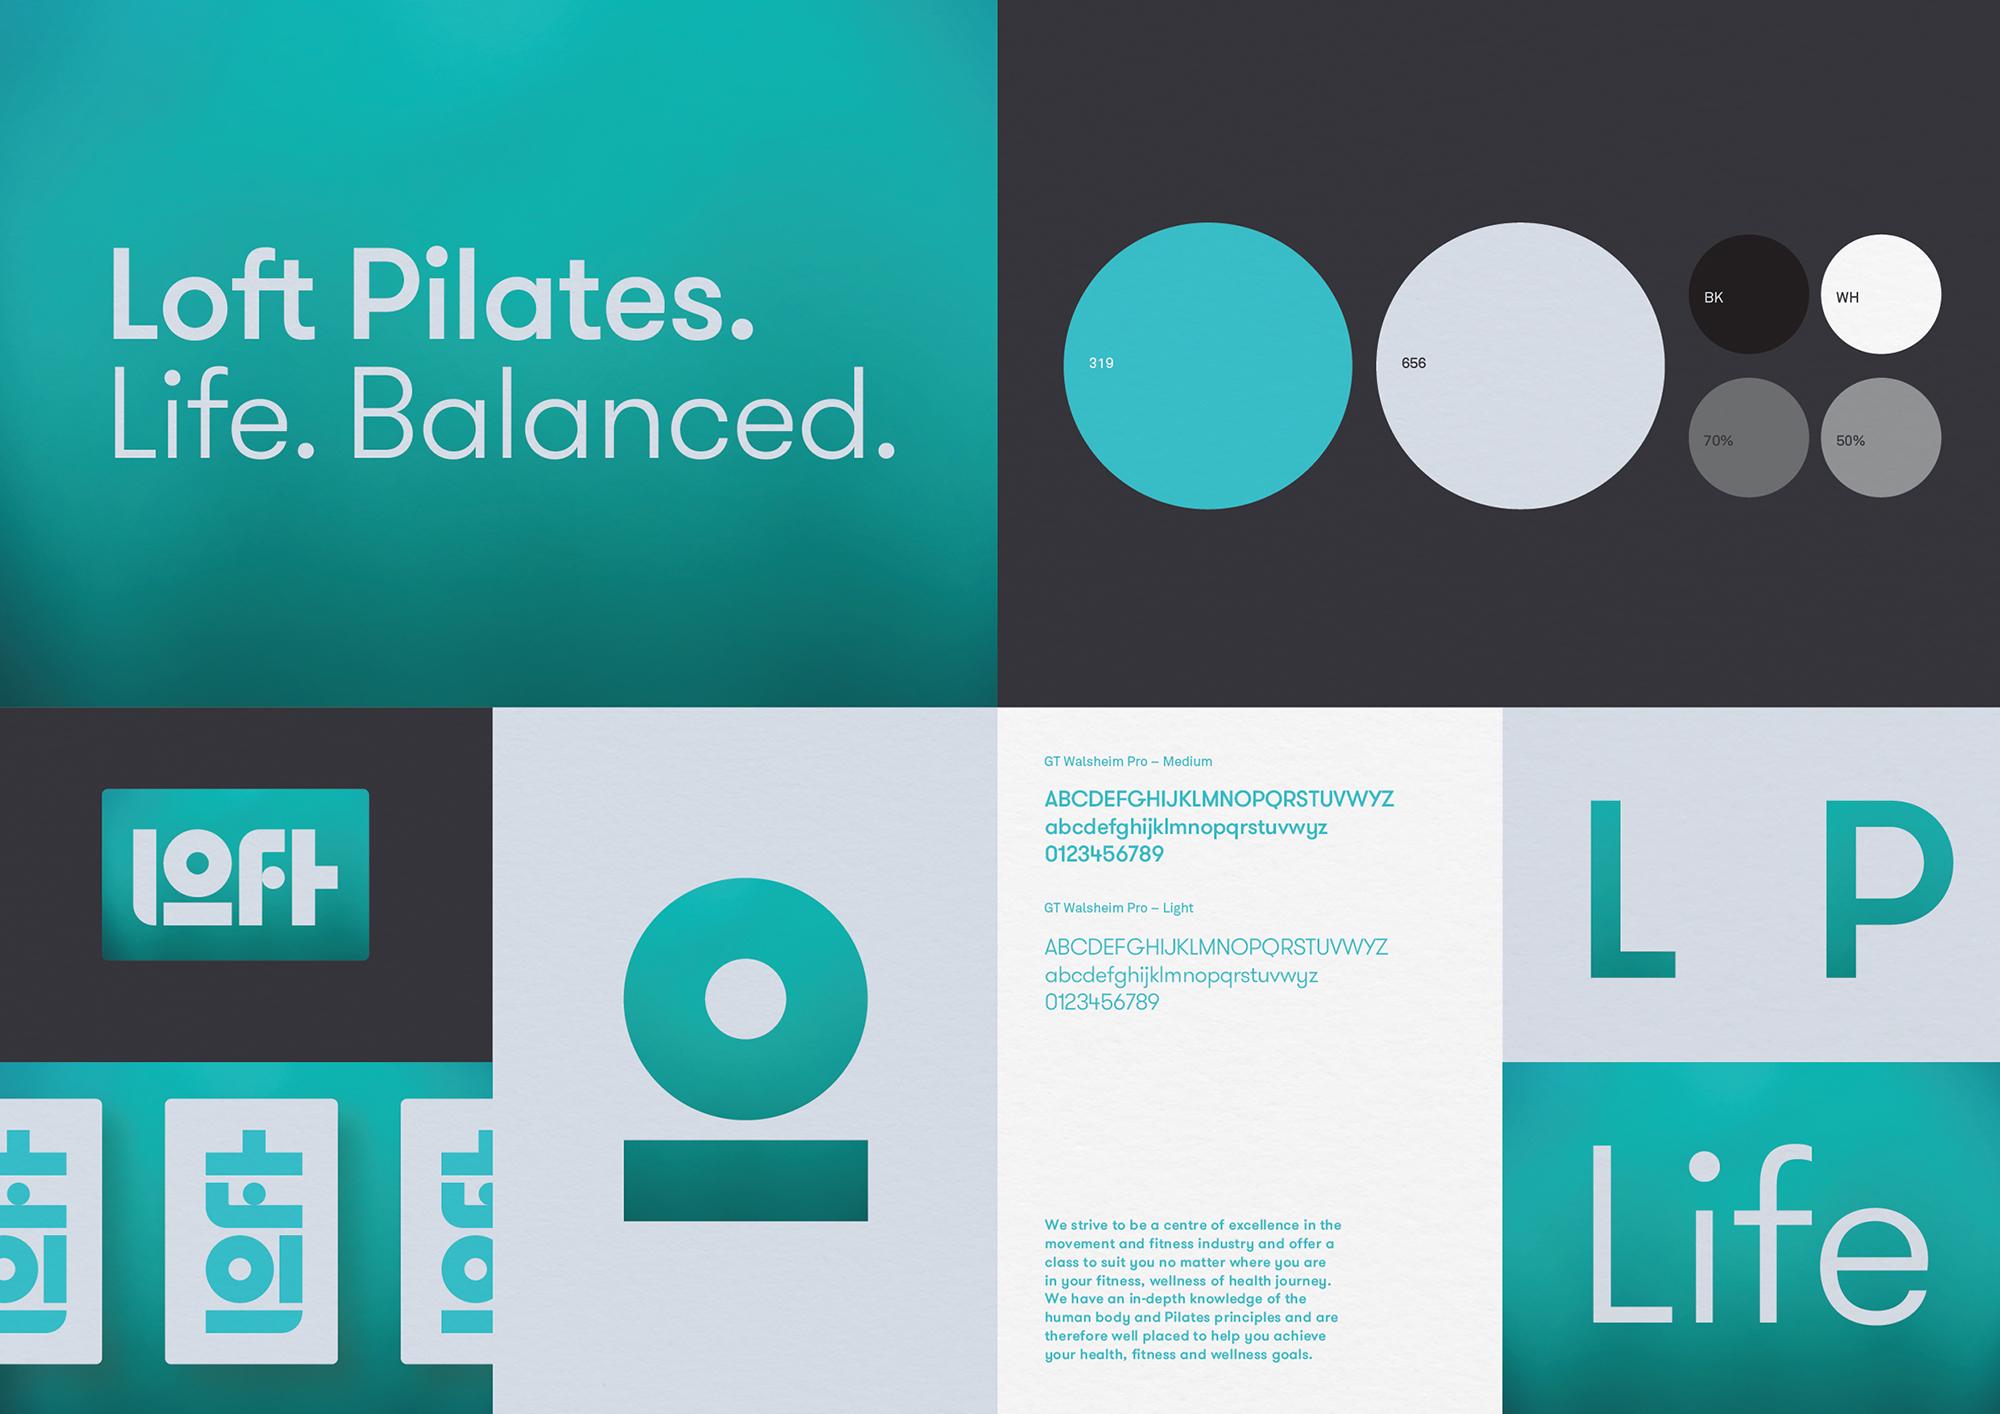 Loft Pilates CS 19-16.jpg